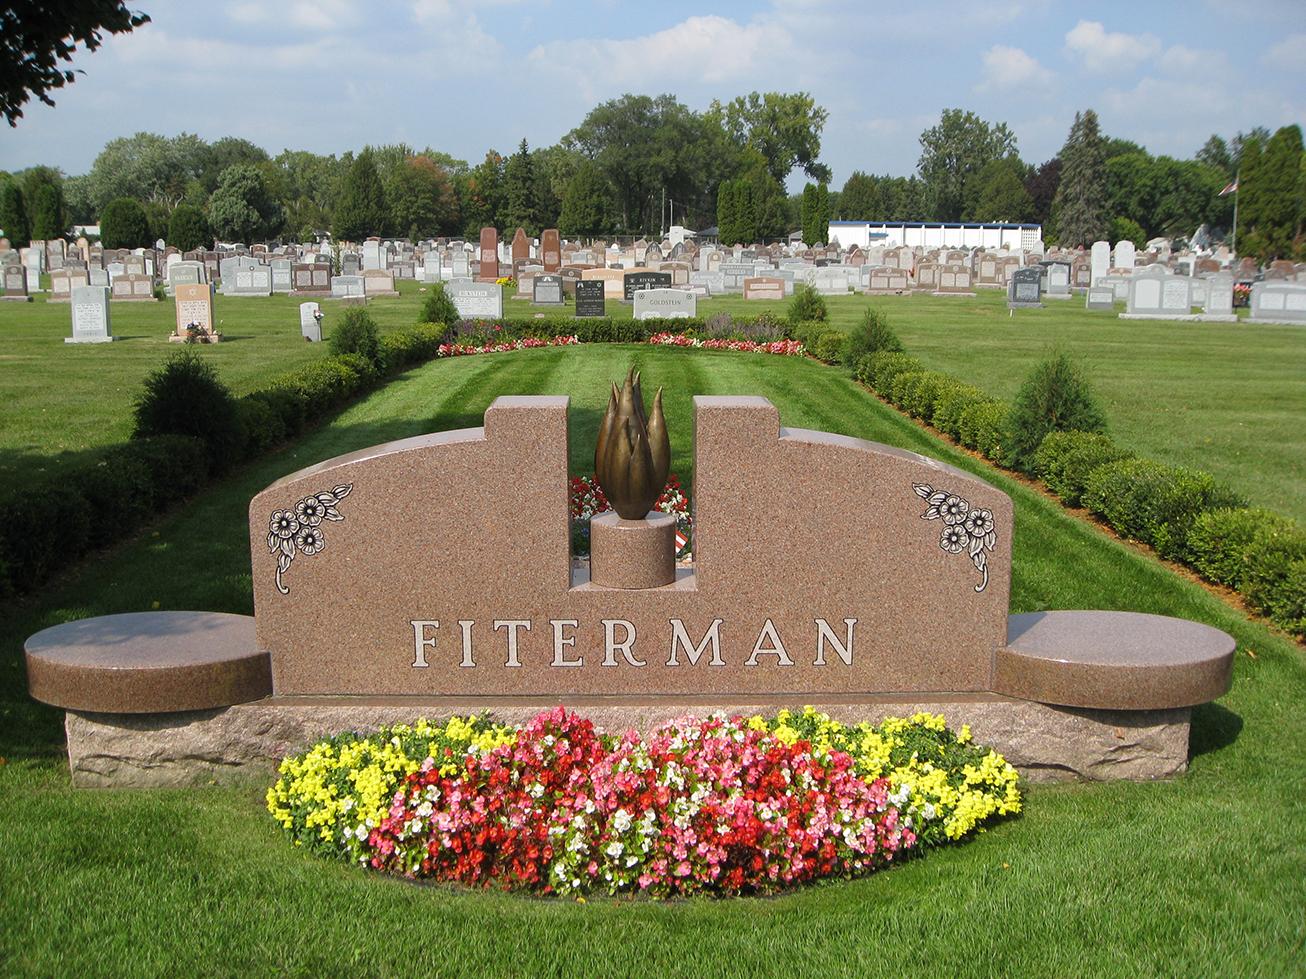 Fitermanfeddema2009a 19